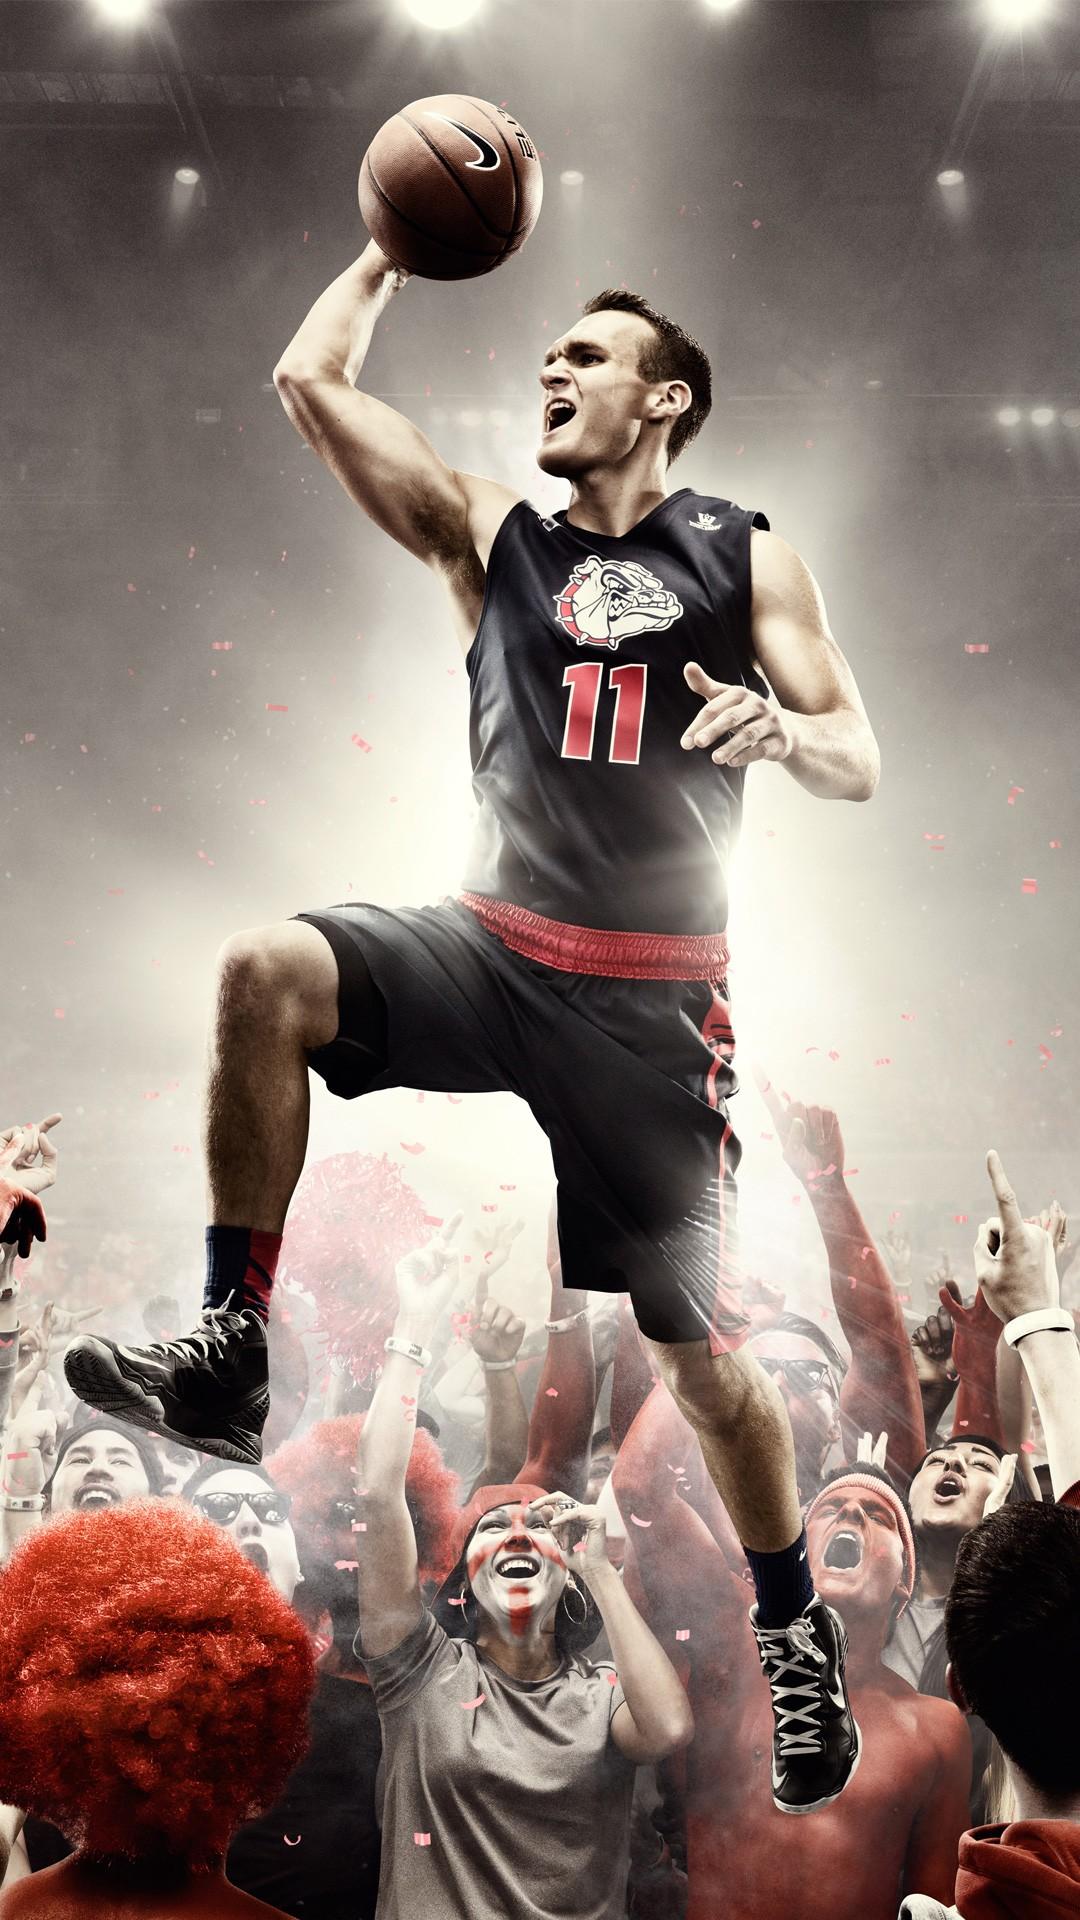 Nike Basketball Hd Wallpaper Nike Basketball Wallpapers Hd Wallpapers Id 17732